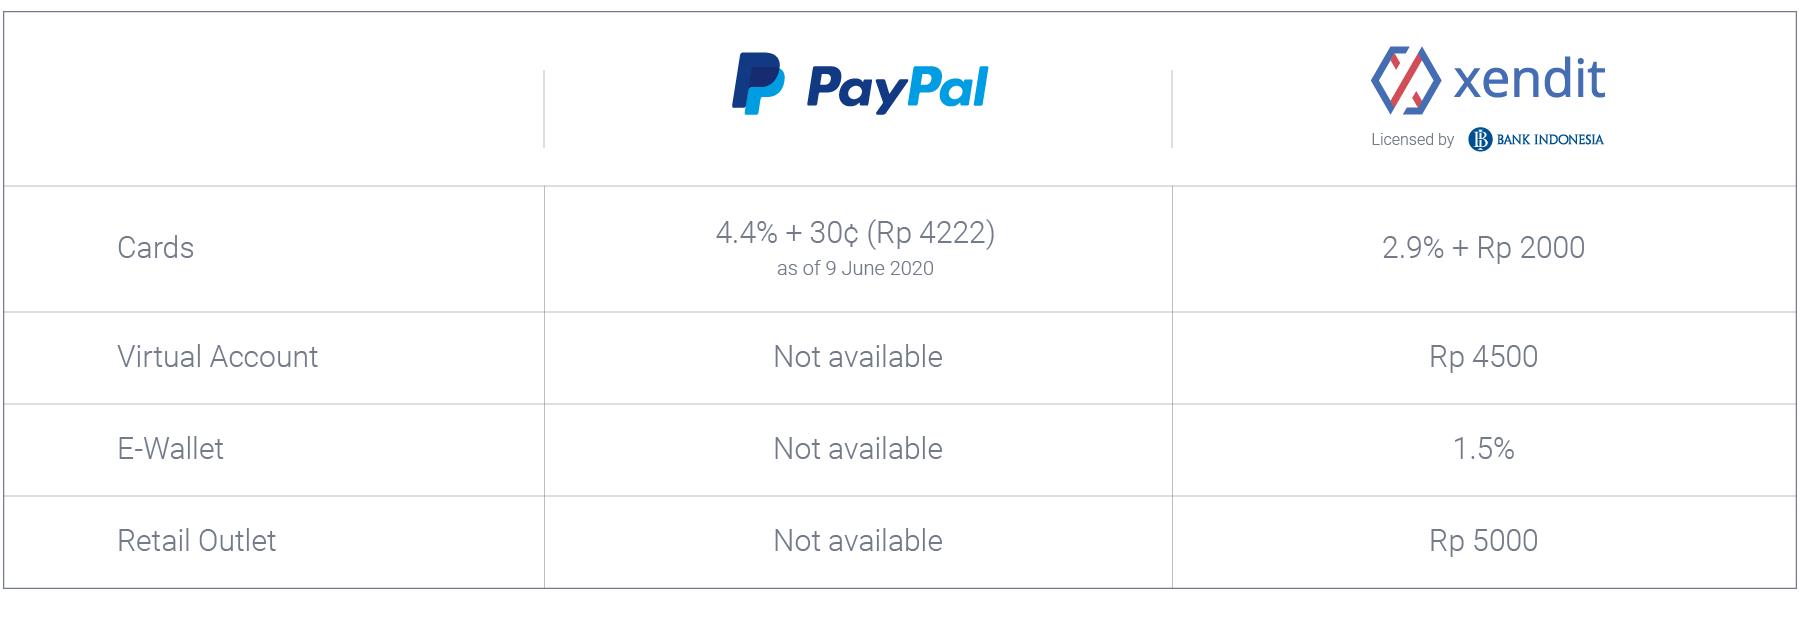 PayPal vs Xendit Pricing